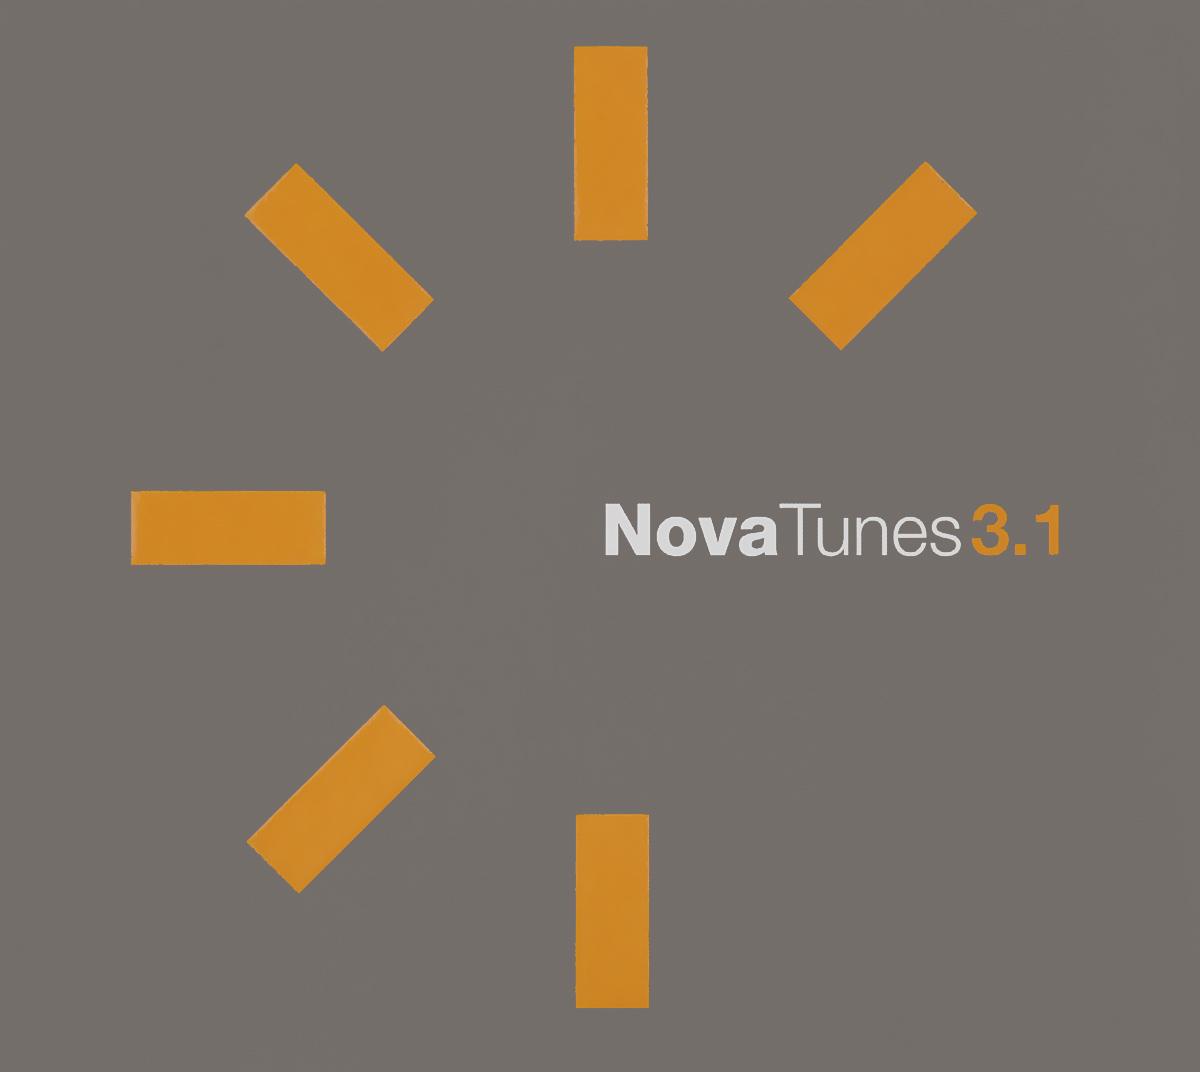 Nova Tunes 3.1 2015 Audio CD